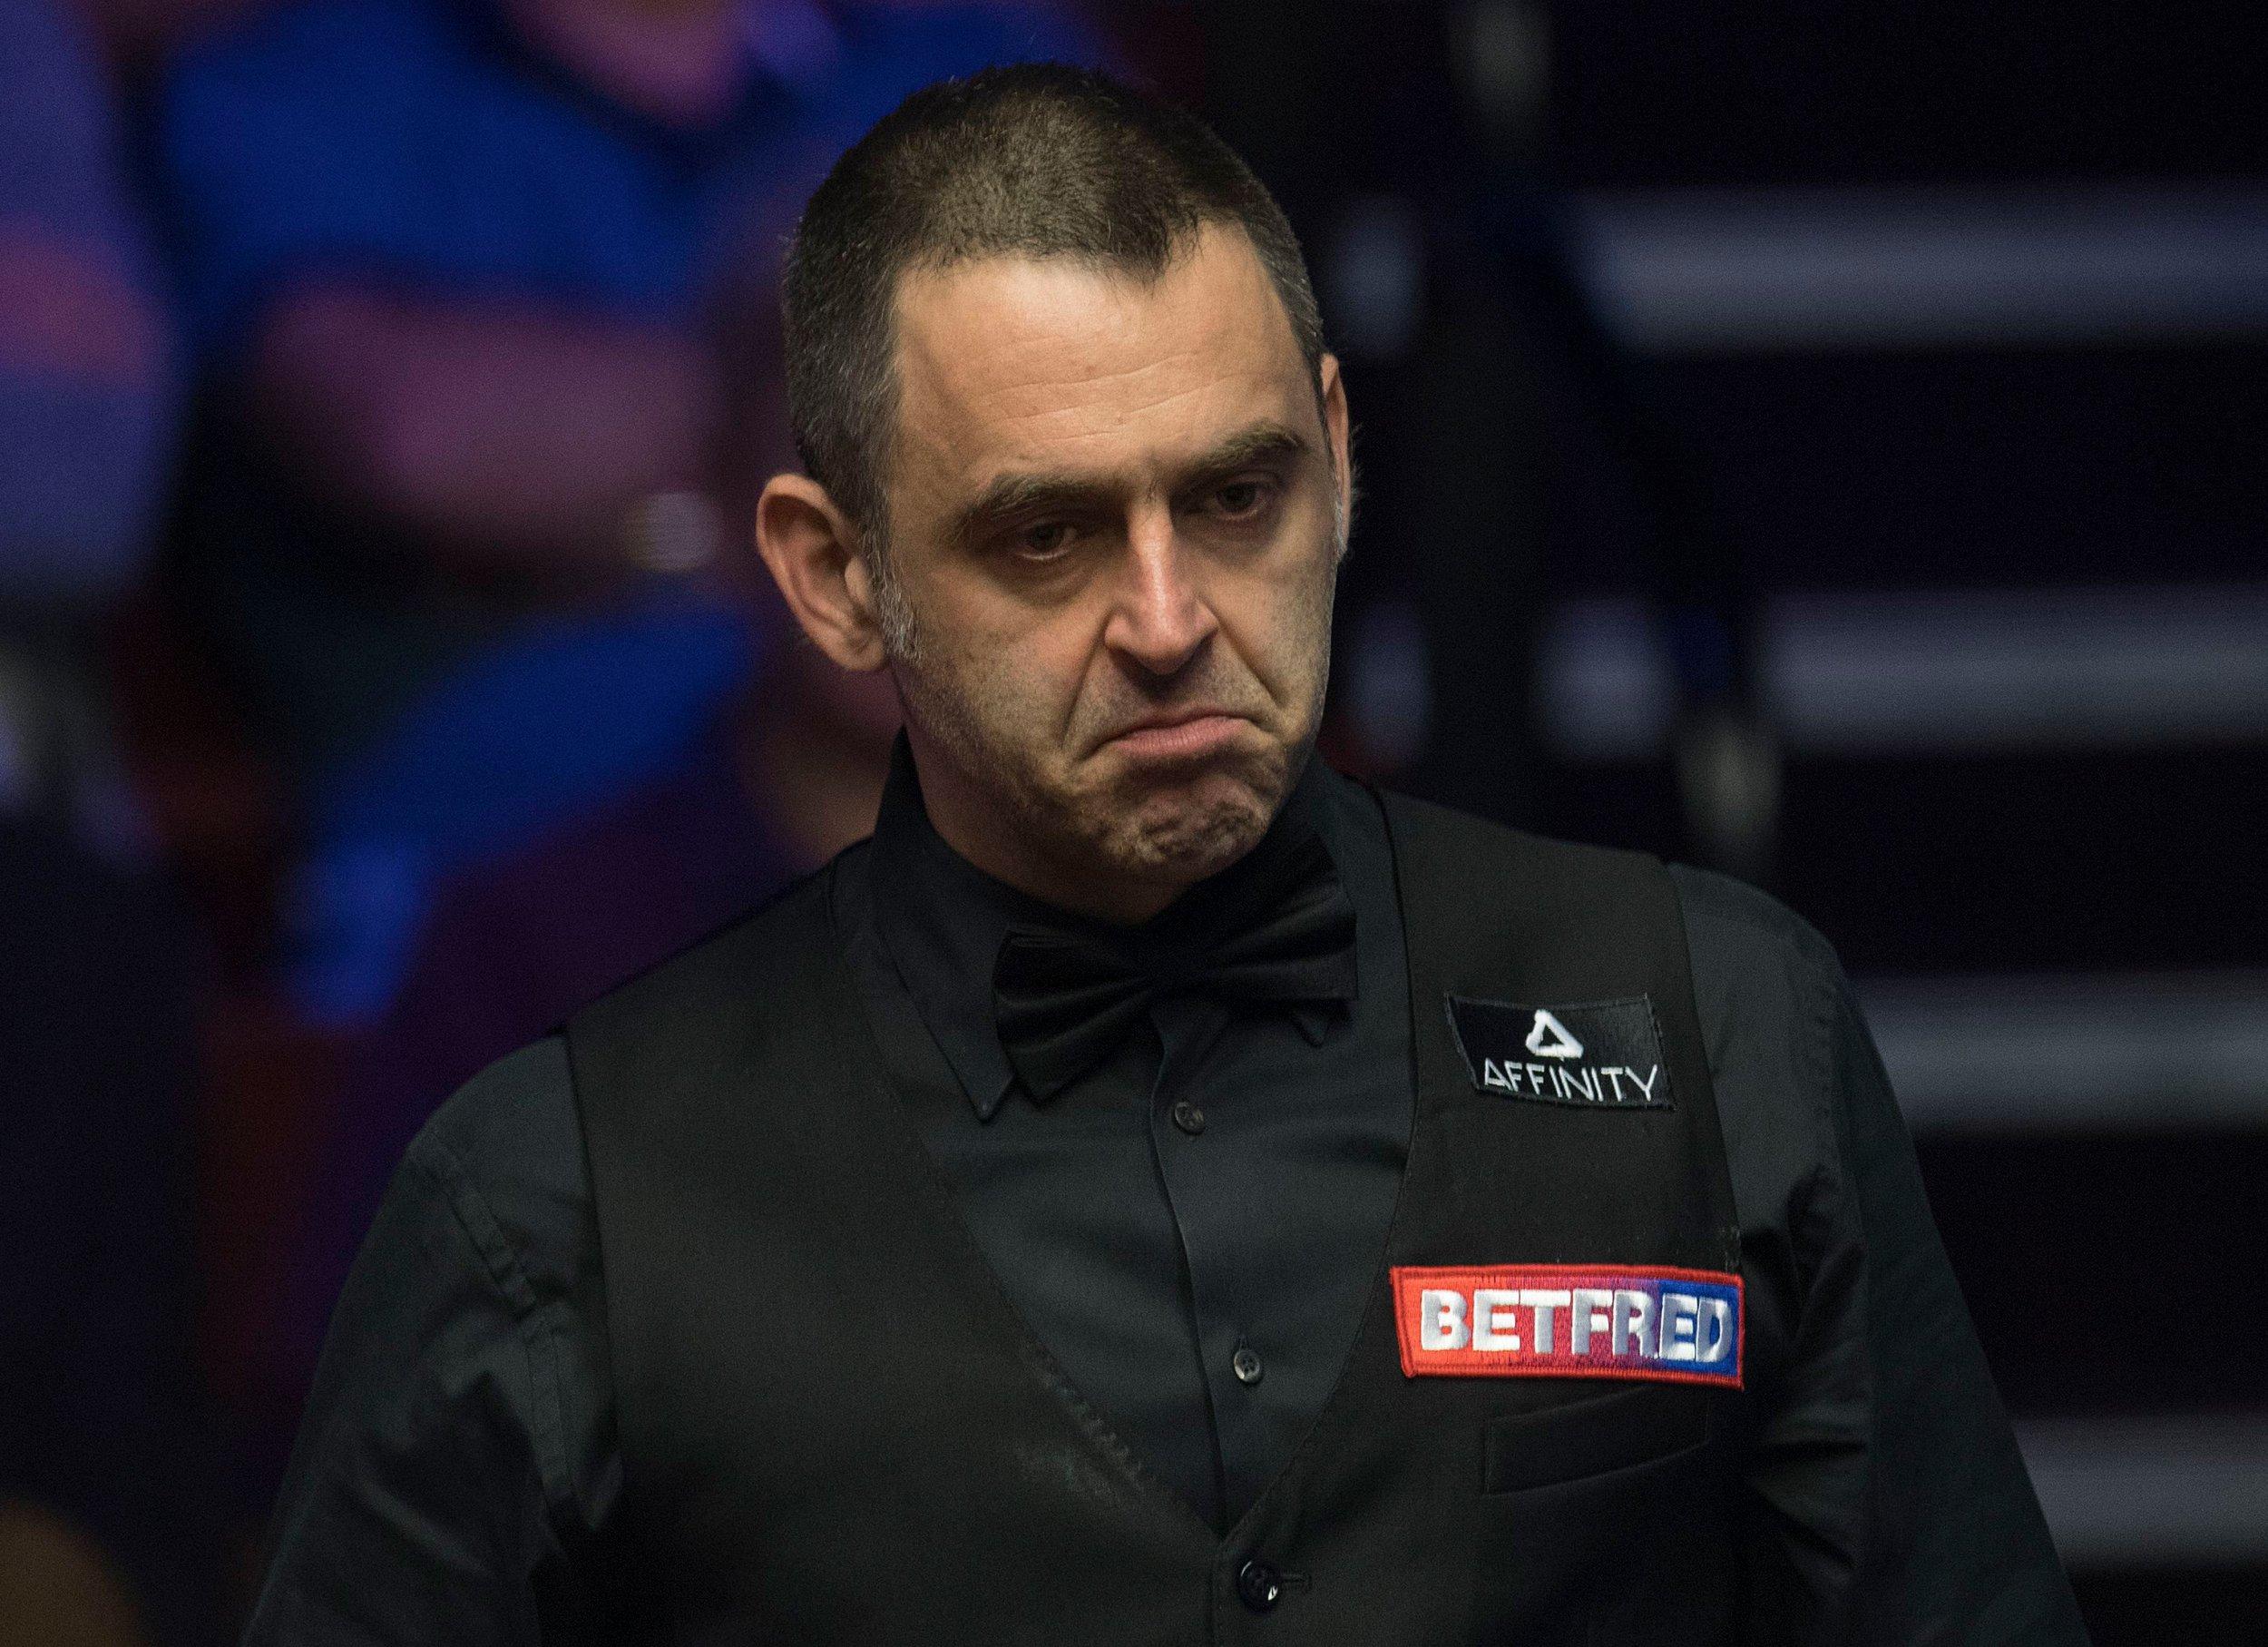 Ronnie O'Sullivan describes Neil Robertson vs John Higgins match as 'amateurish' amid Crucible table trouble